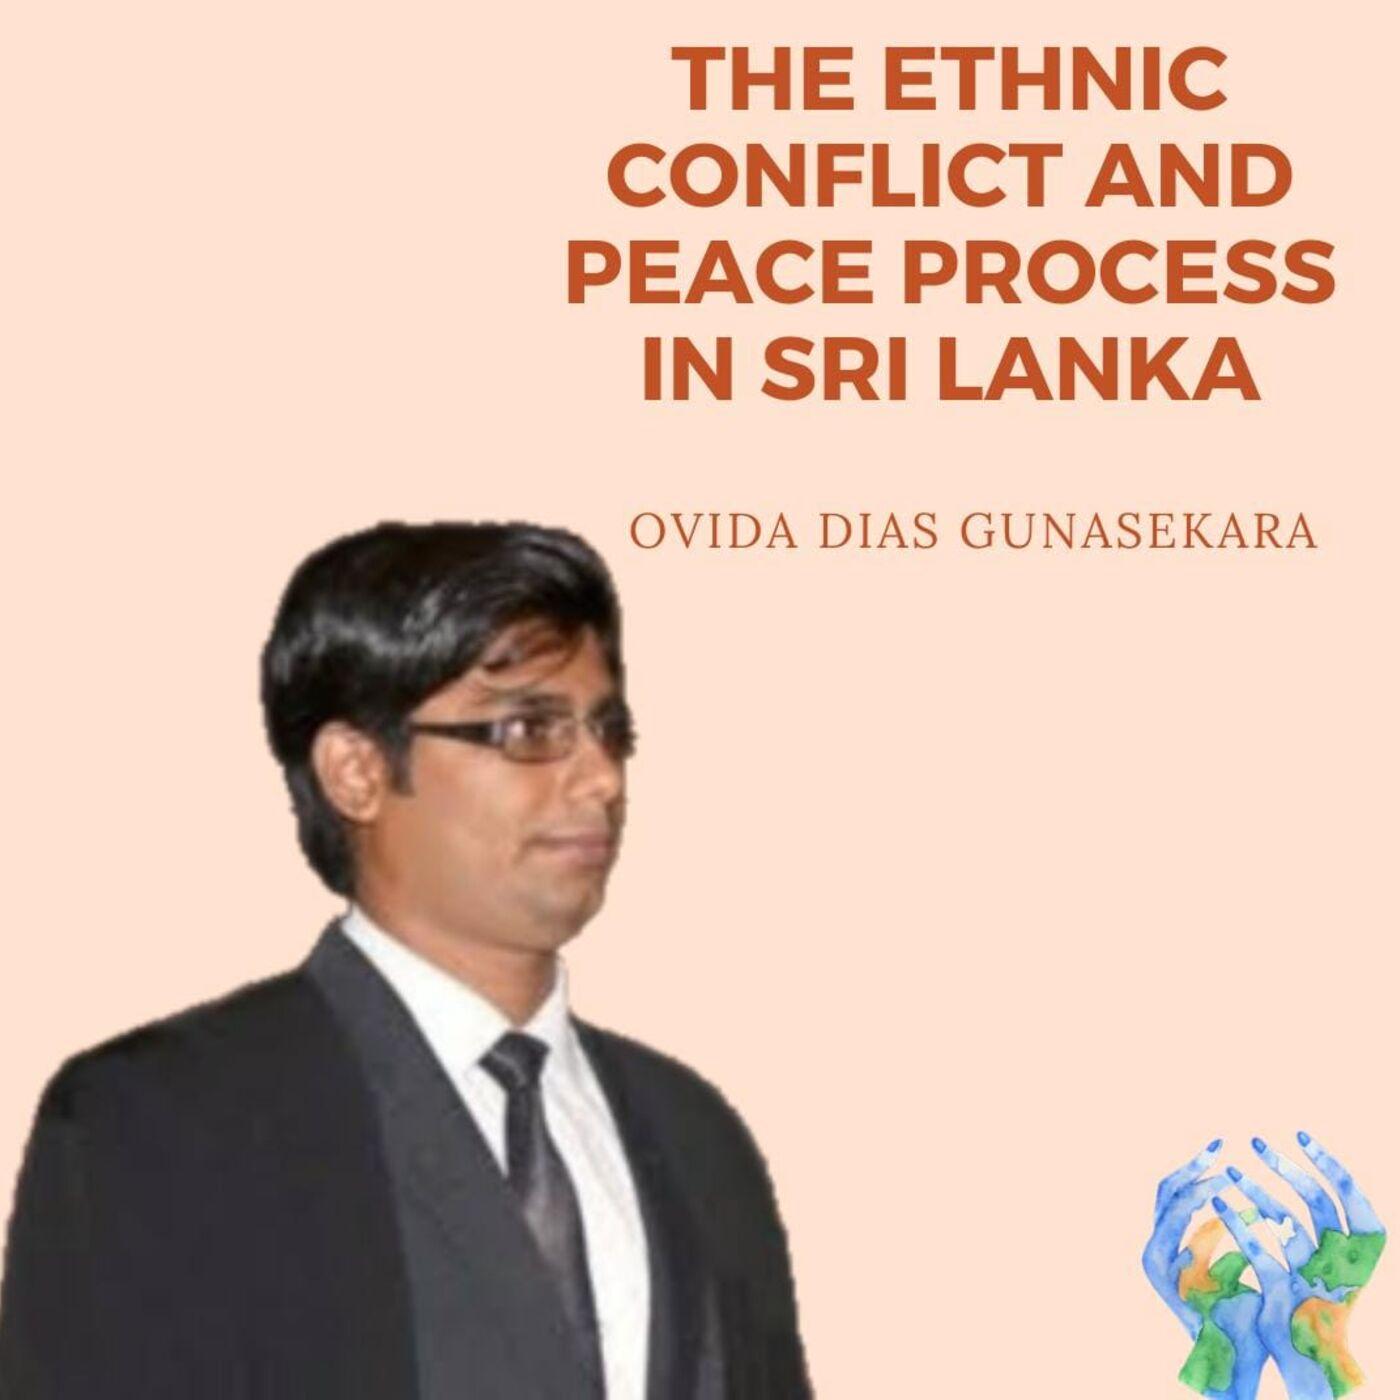 The Ethnic Conflict and Peace Process in Sri Lanka with Ovida Dias Gunasekara